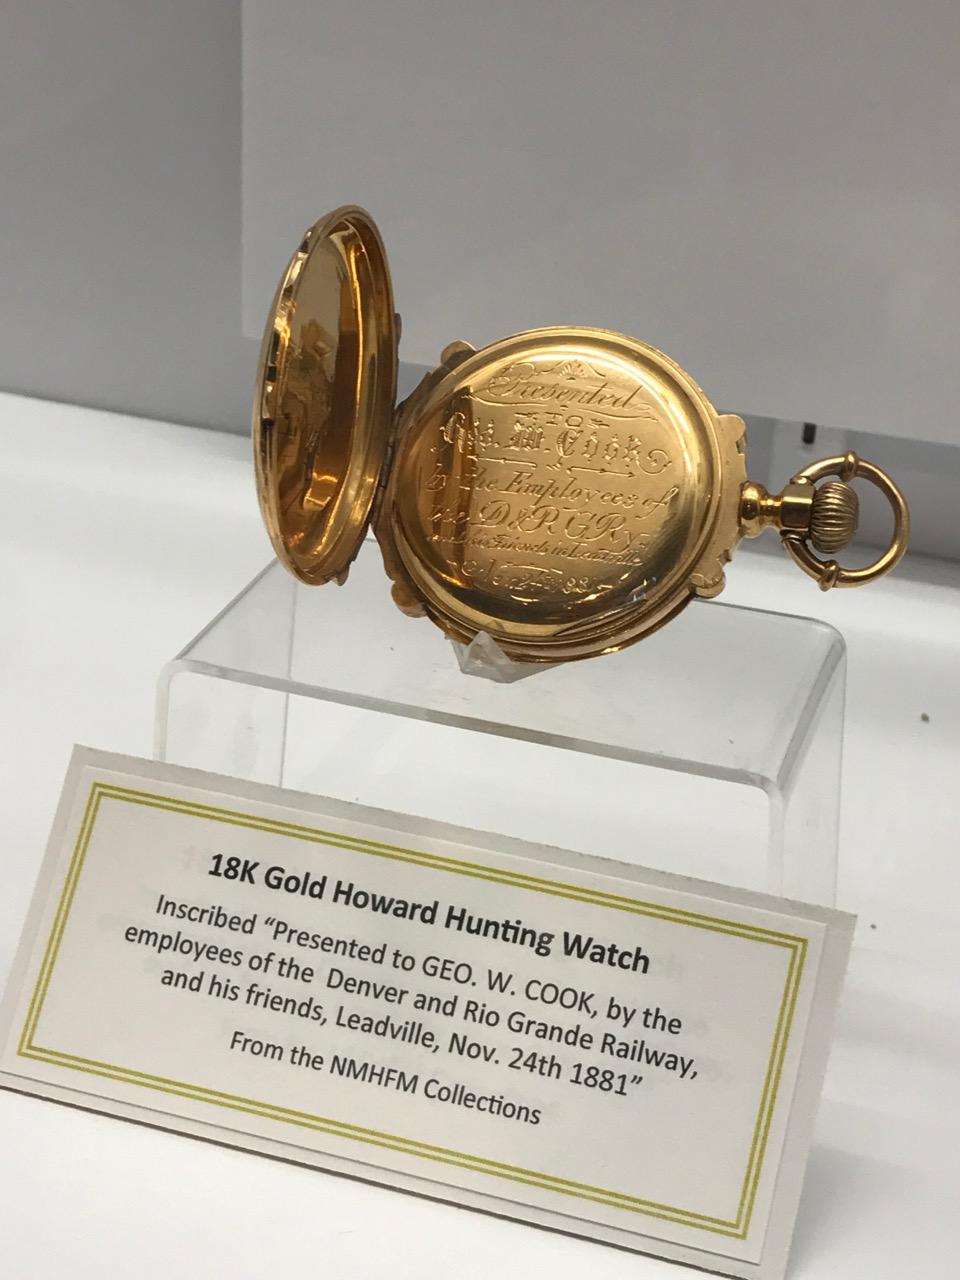 18K Gold Howard Hunting Watch